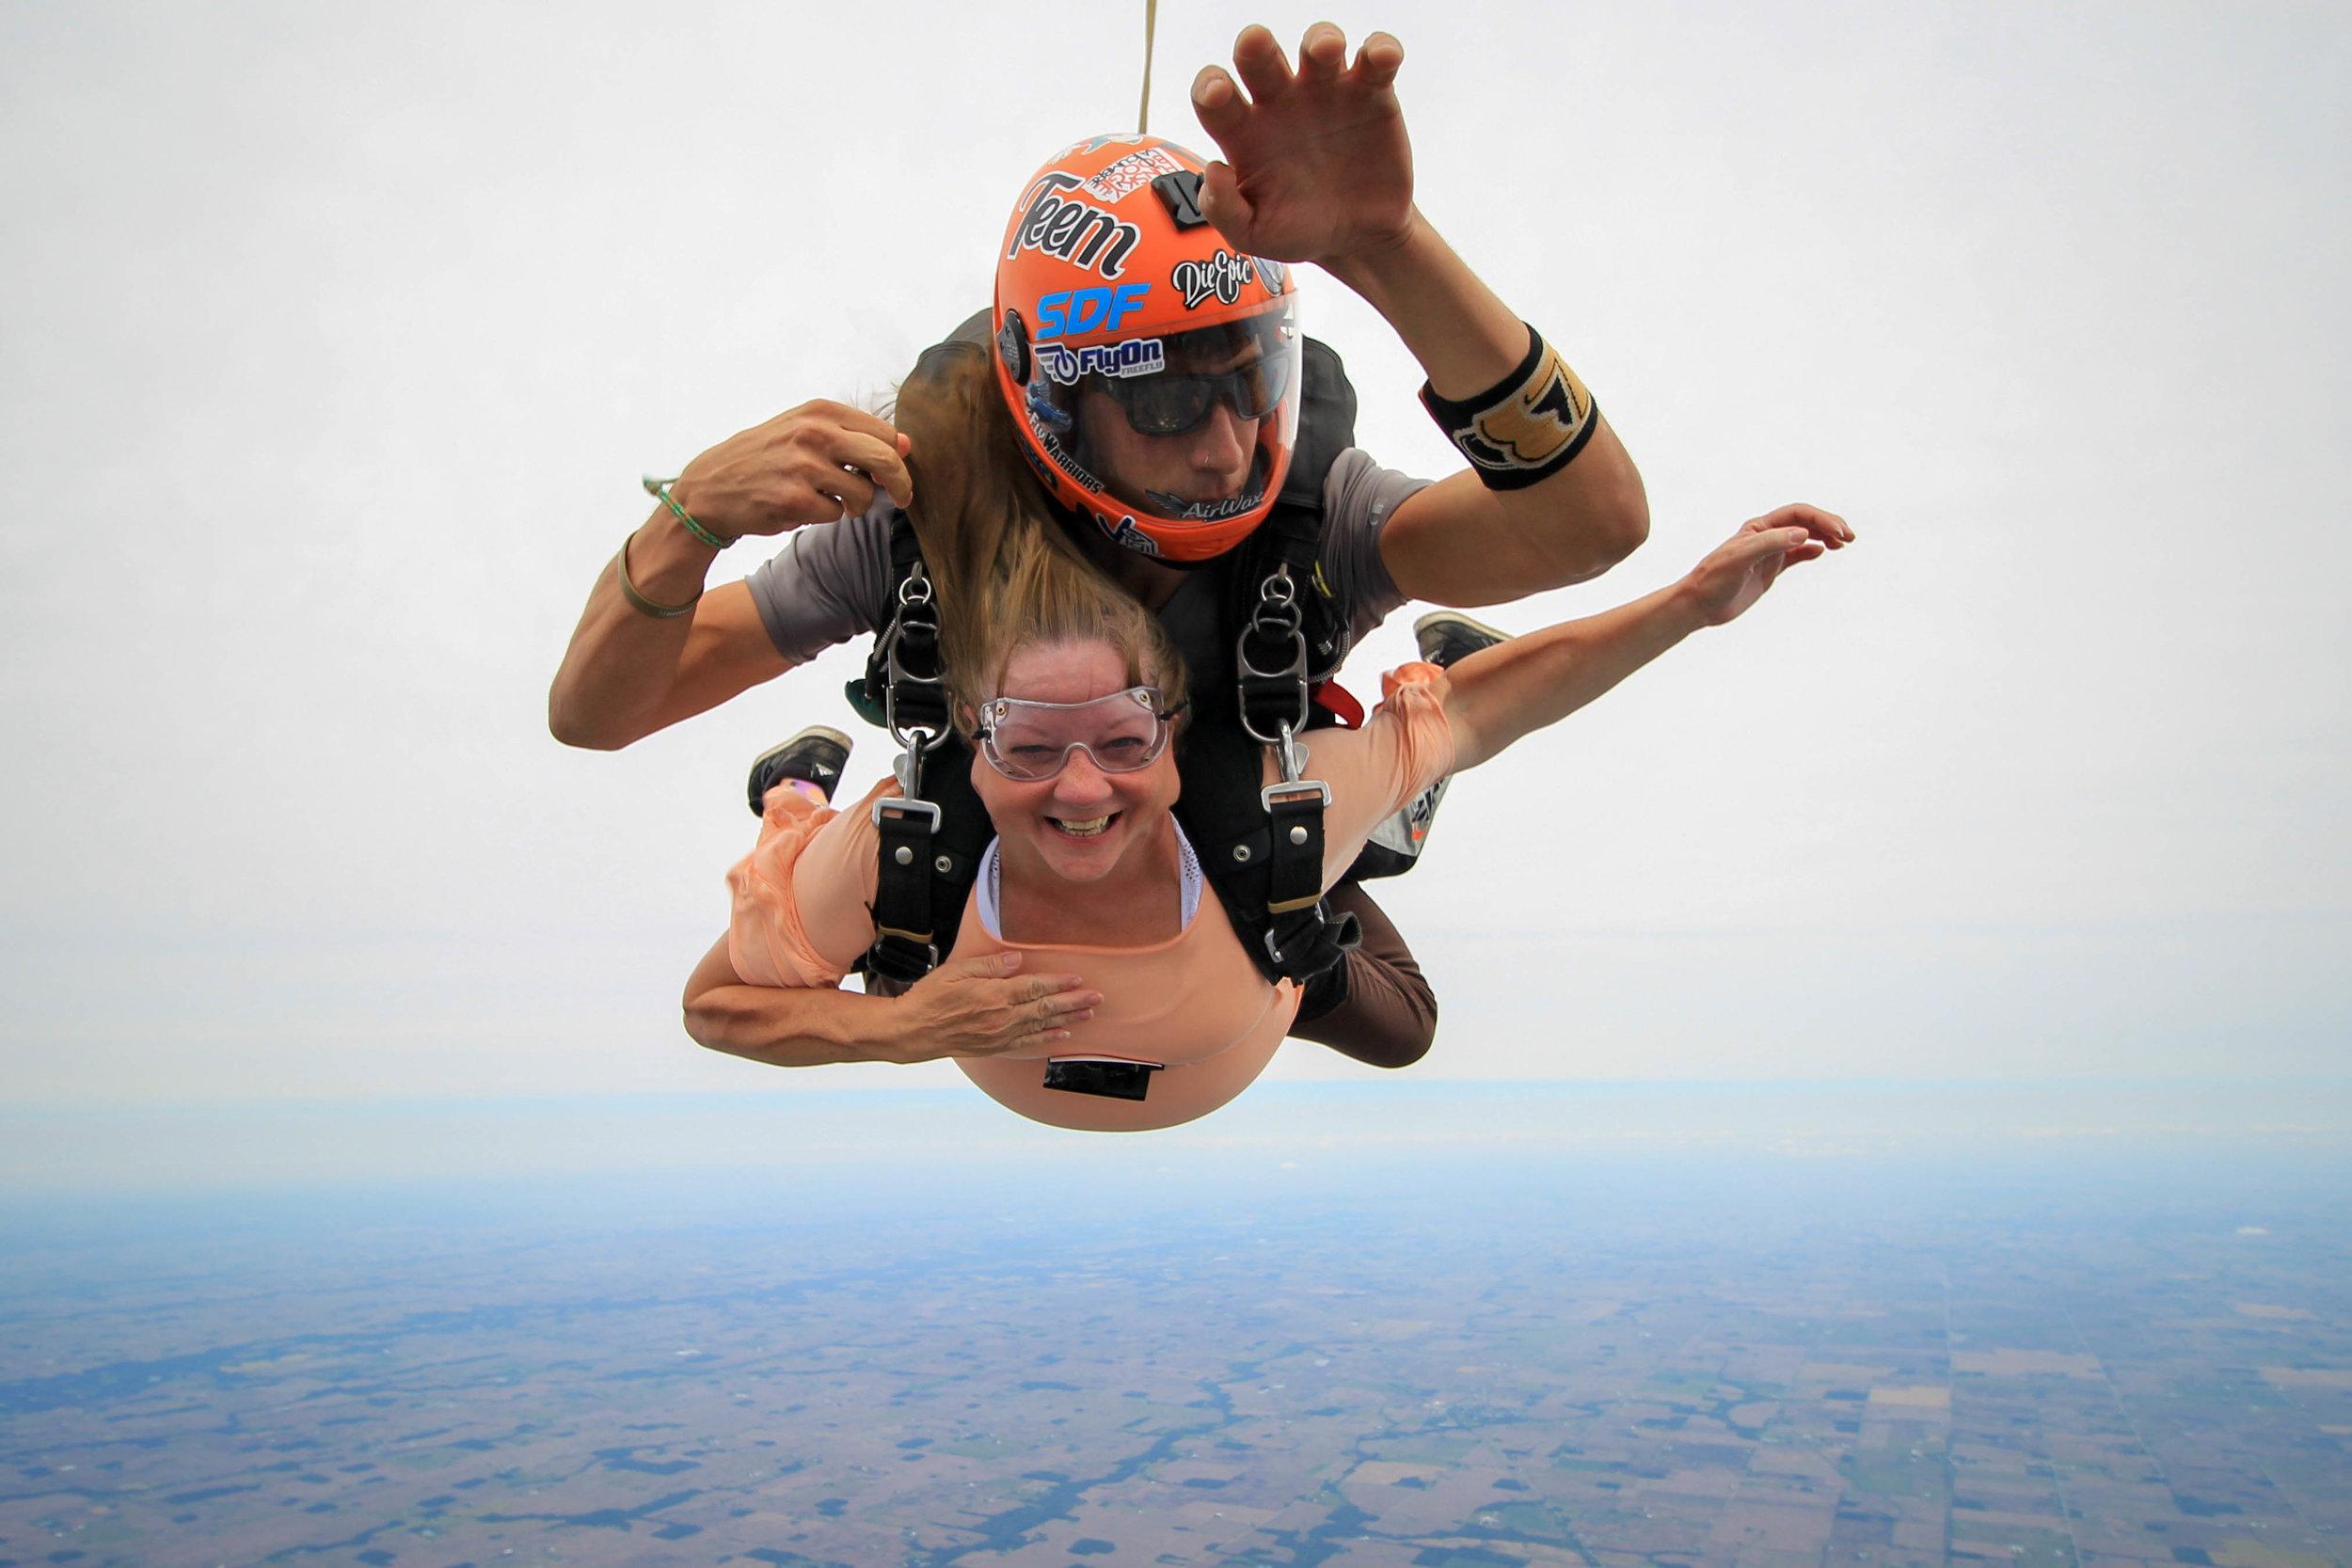 tandem skydive, tandem student Dana